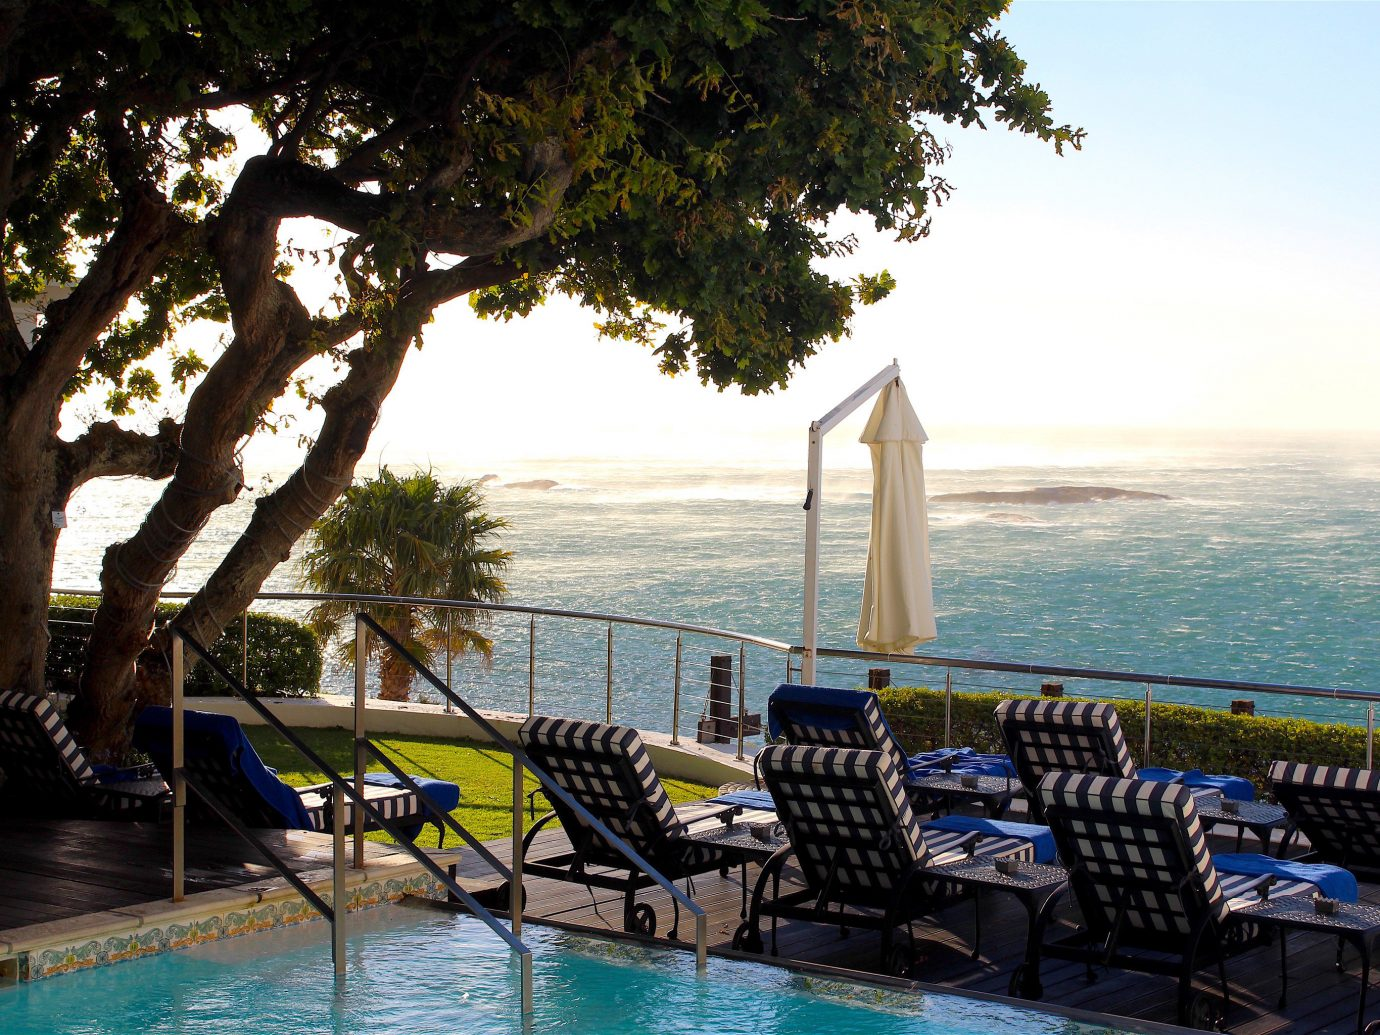 Outdoors + Adventure Safaris Trip Ideas tree water outdoor sky leisure swimming pool vacation Sea Resort estate caribbean bay overlooking lined shore